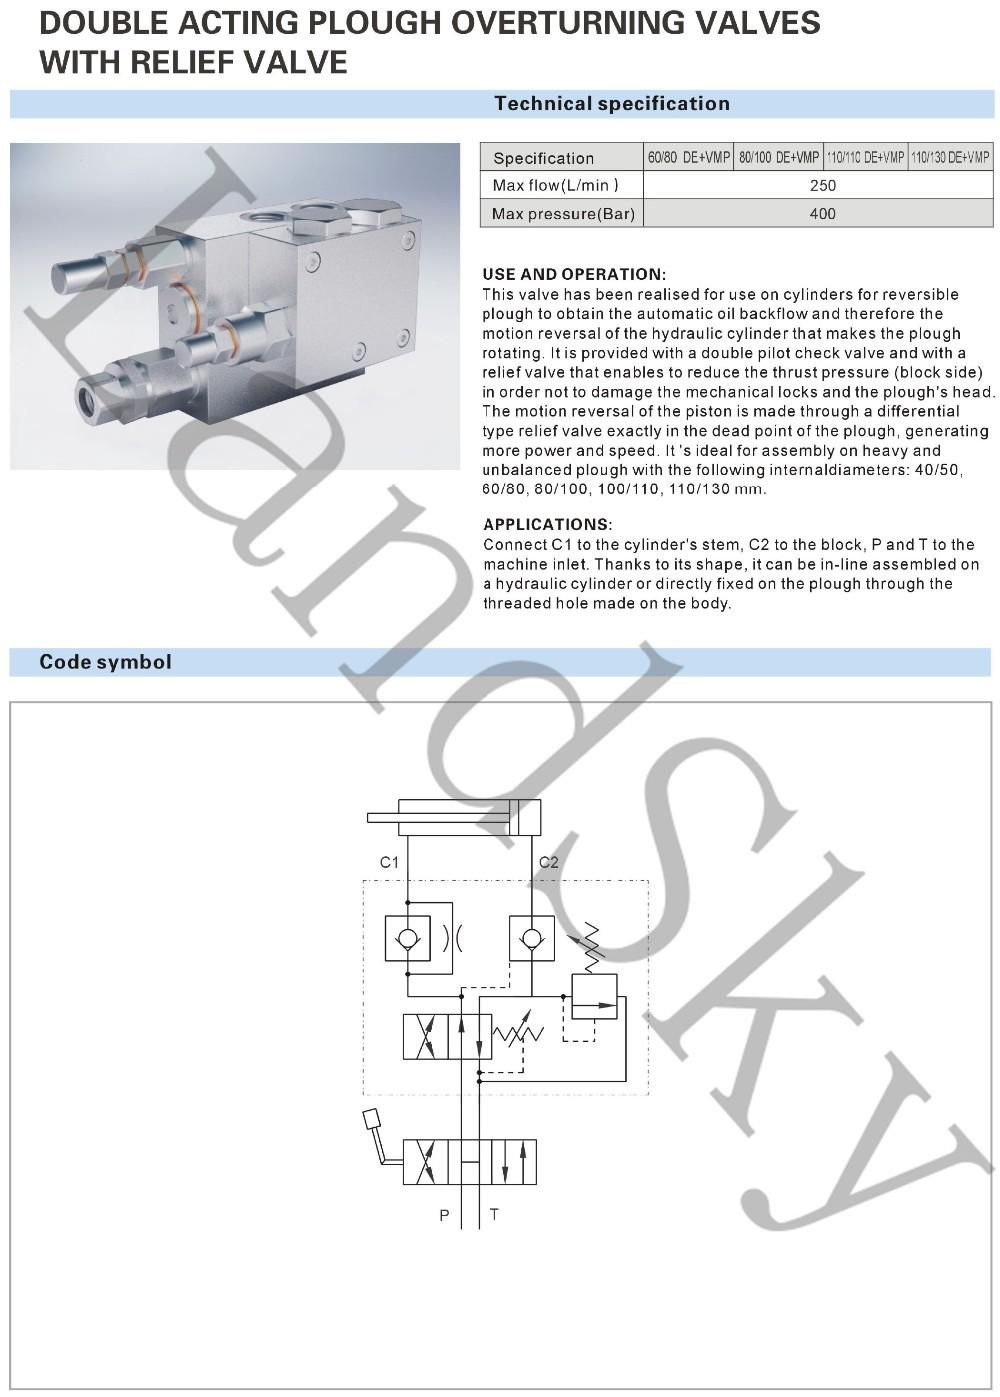 hight resolution of landsky rap 100 110 de vmp g3 8 hydraulic external double acting plough